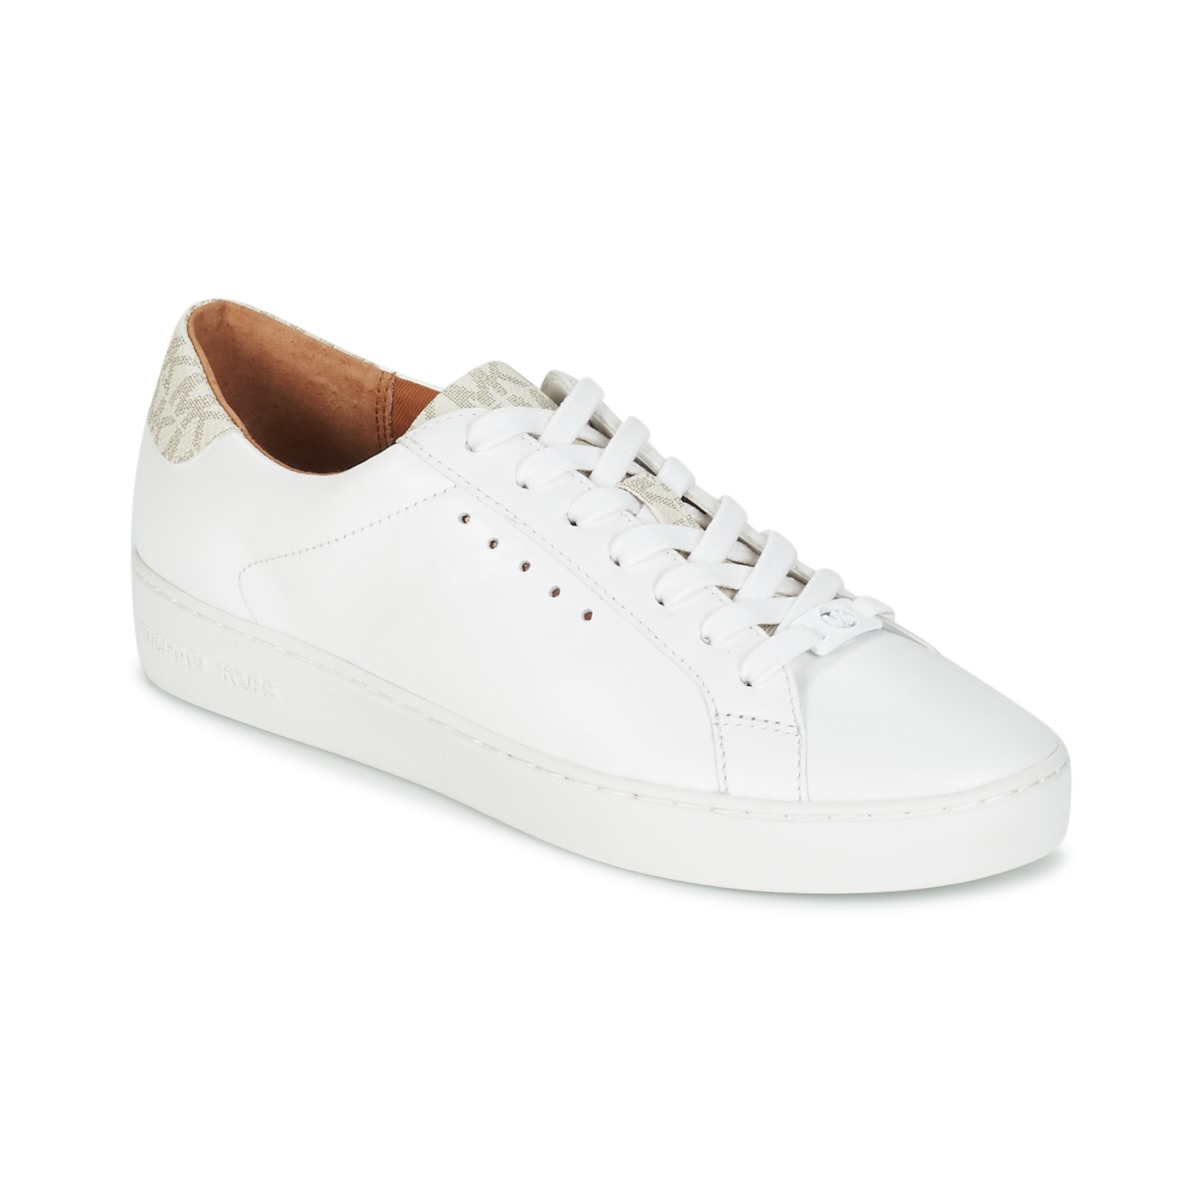 MICHAEL MICHAEL KORS - Nízke tenisky MICHAEL MICHAEL KORS biela obuv ... 8f86be81969